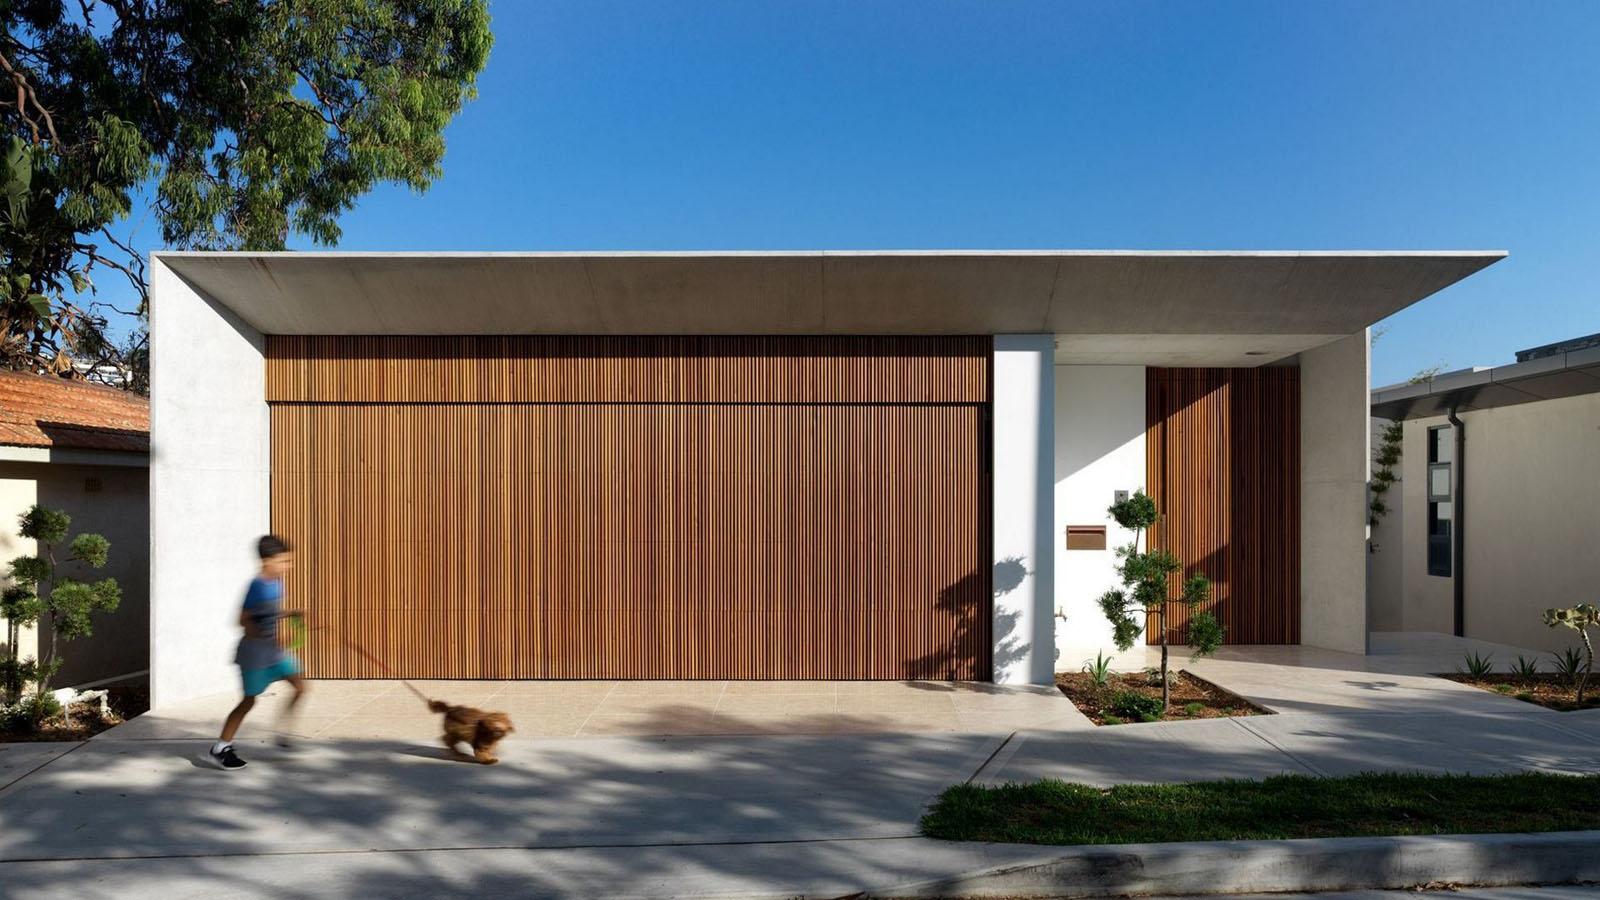 best single story home design full size of contemporary one story home design modern single house